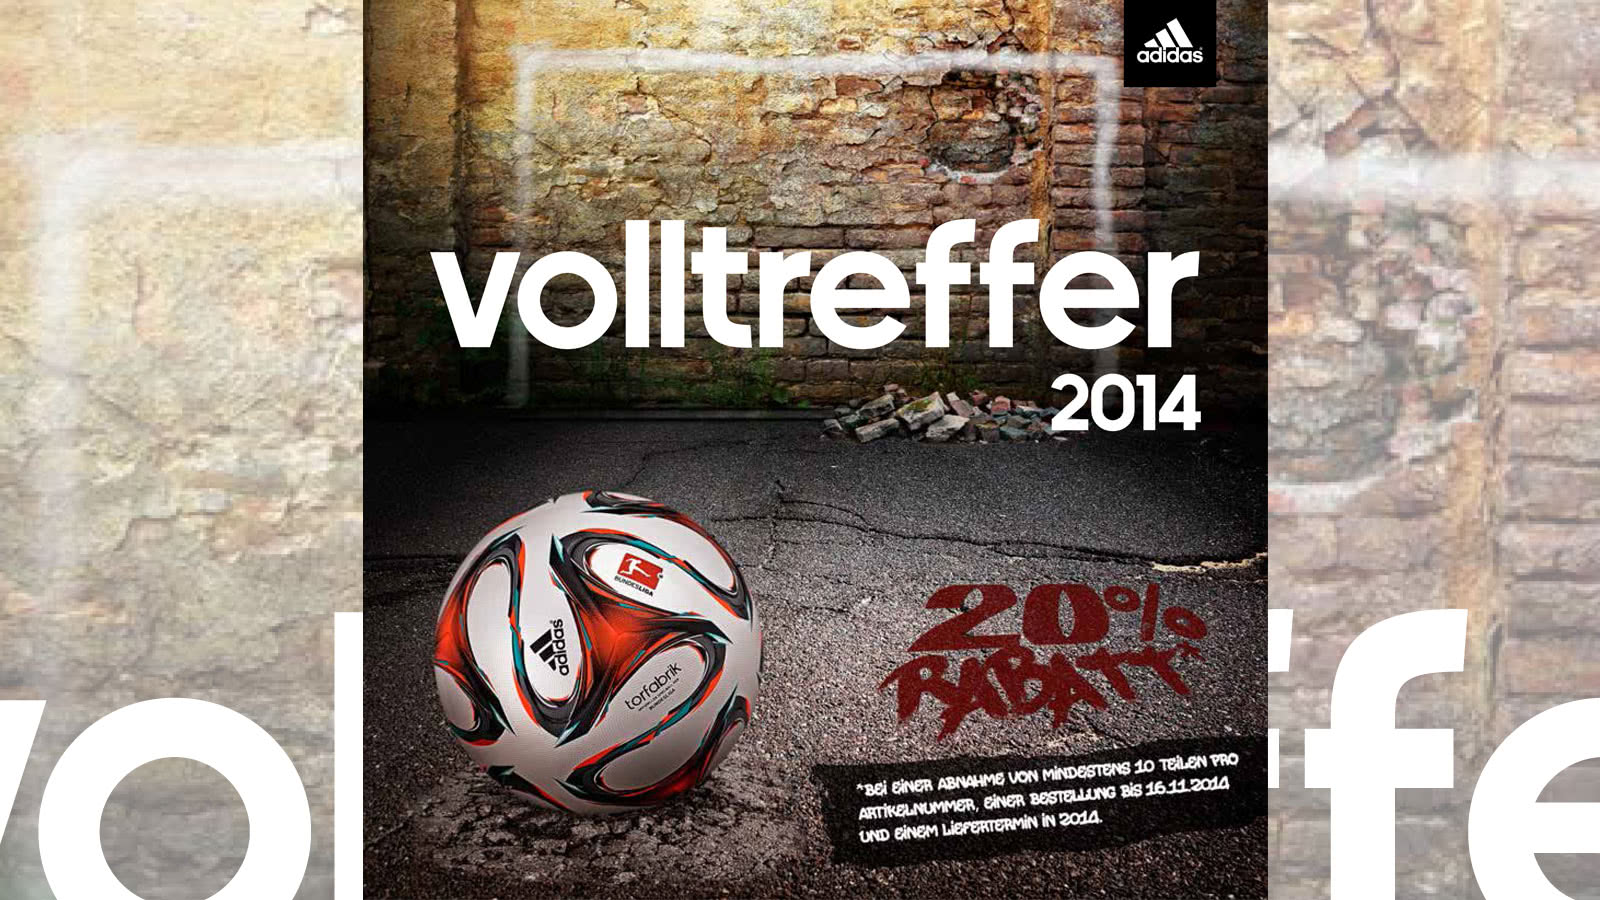 Adidas Volltreffer Flyer 2014/2015